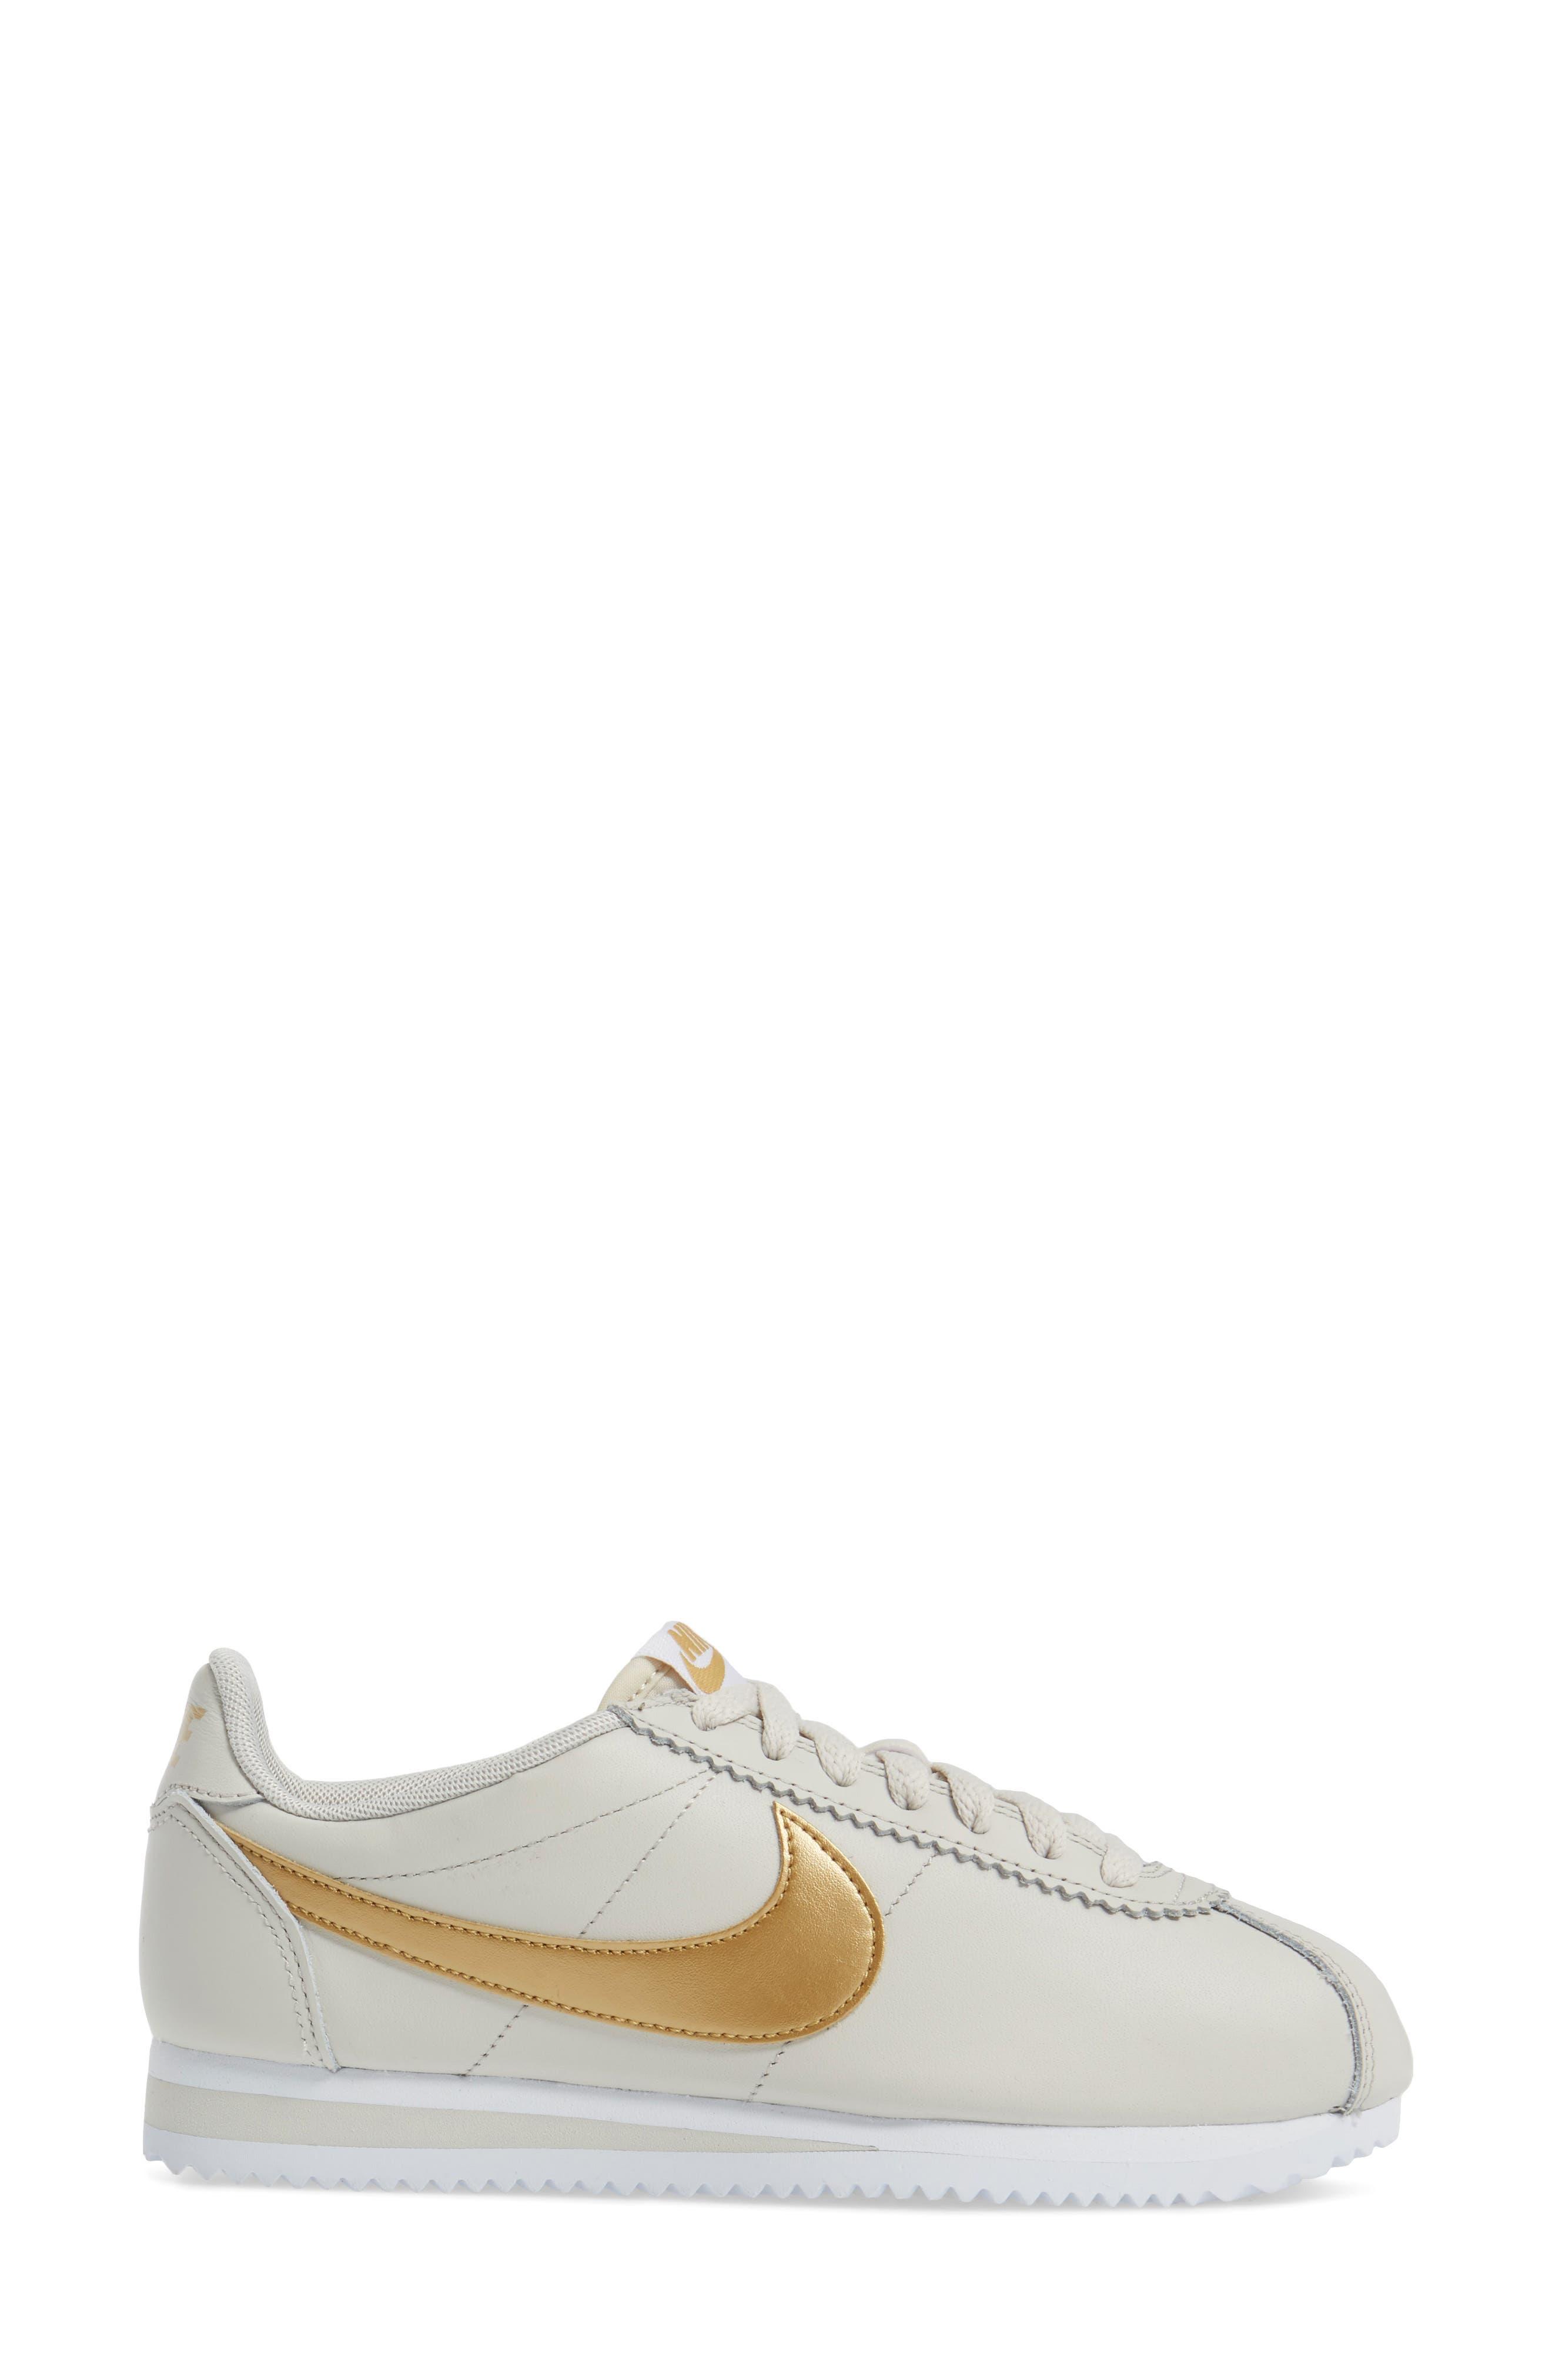 'Classic Cortez' Sneaker,                             Alternate thumbnail 2, color,                             Bone